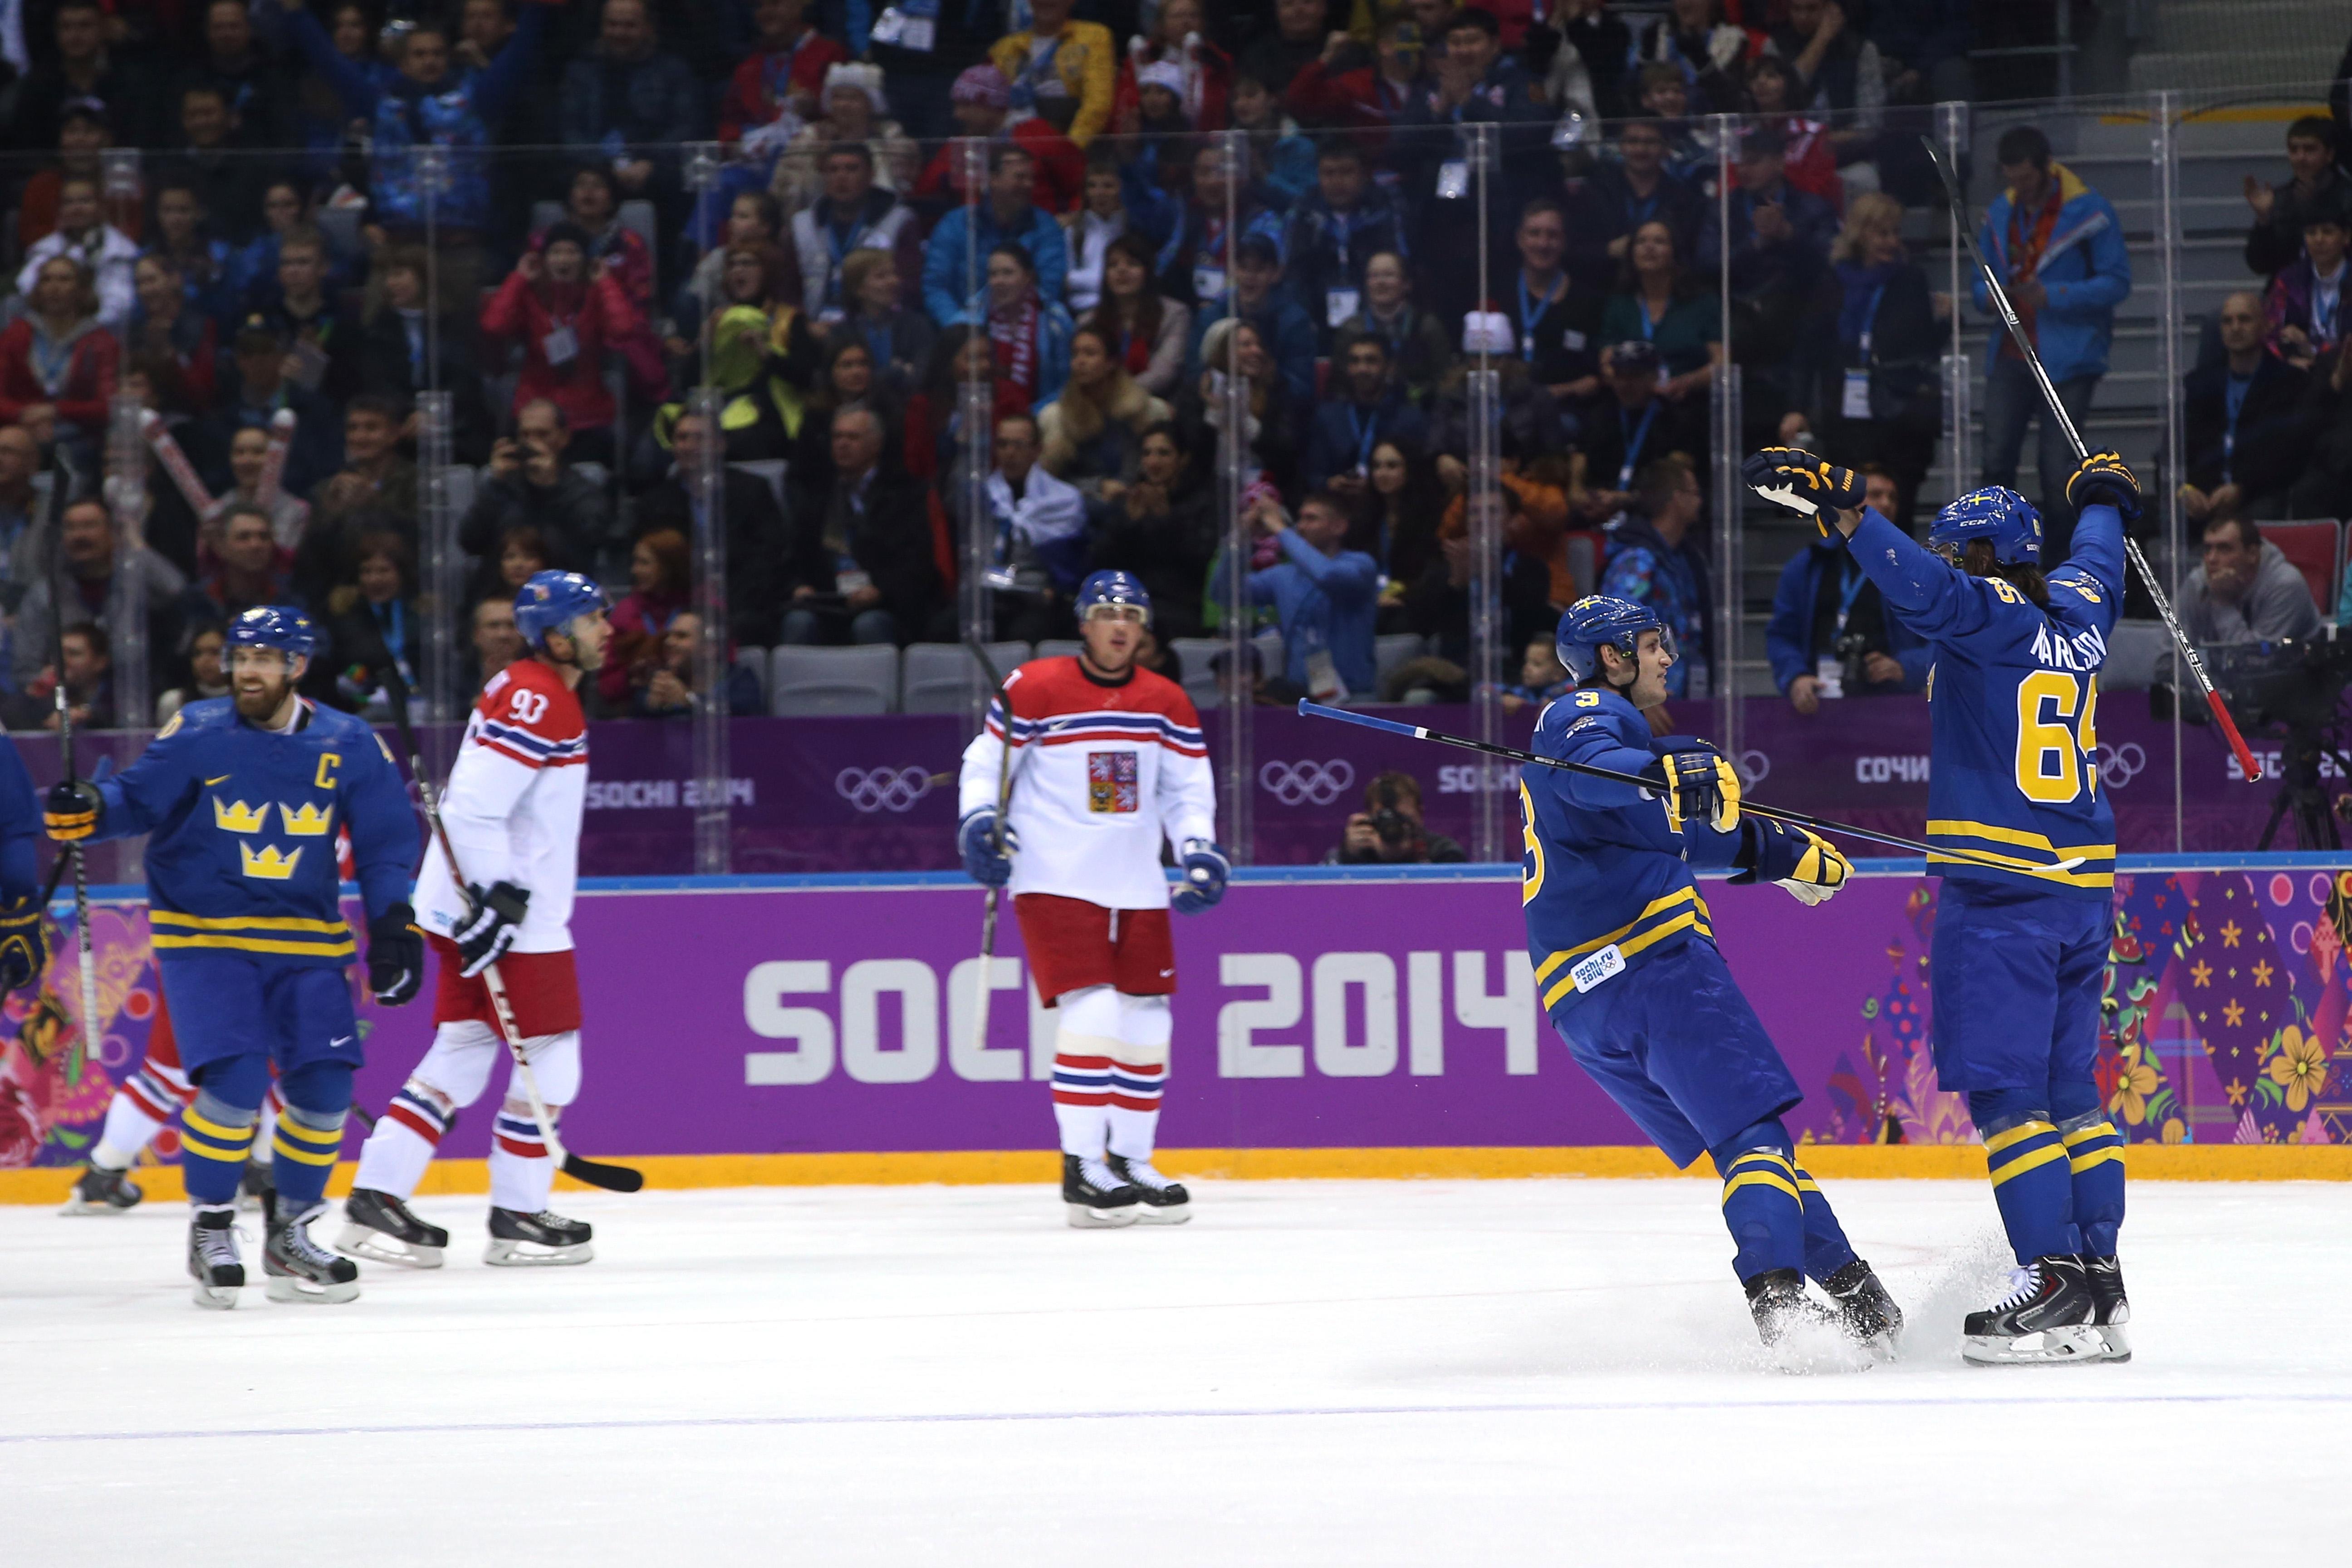 Ice Hockey - Winter Olympics Day 5 - Czech Republic v Sweden